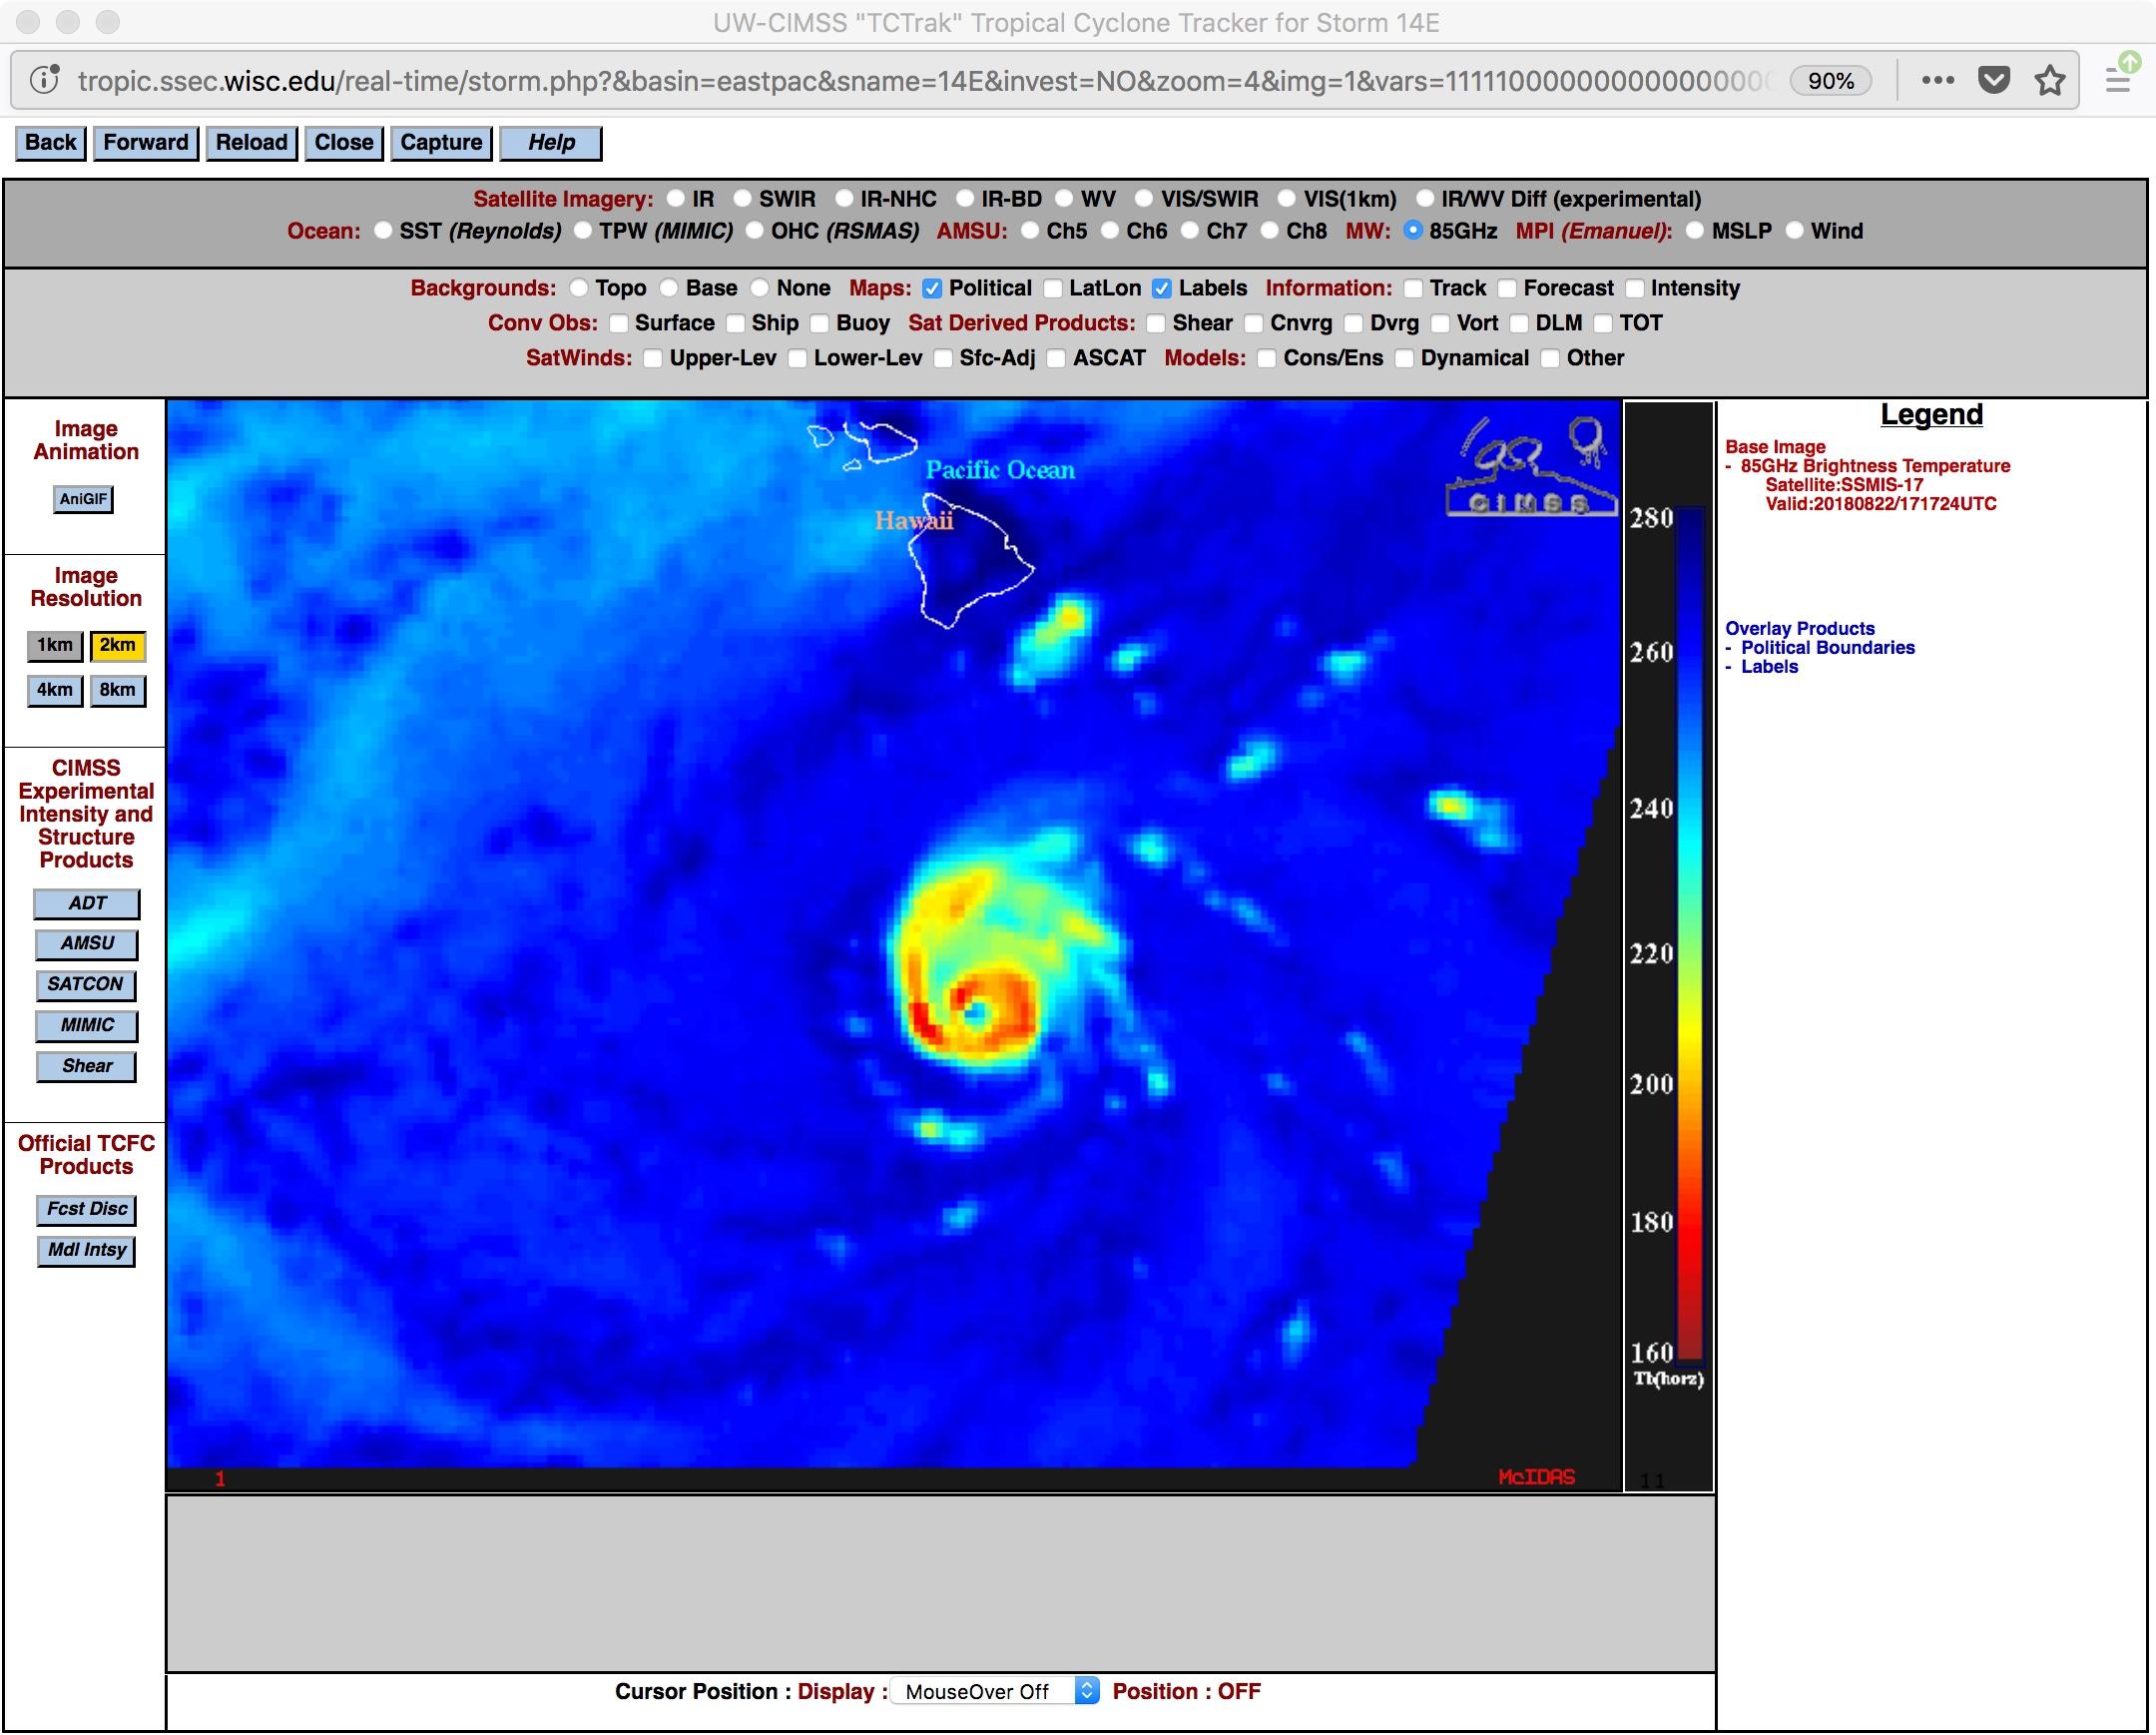 DMSP-17 SSMIS Microwave (85 GHz) image at 1717 UTC [click to enlarge]